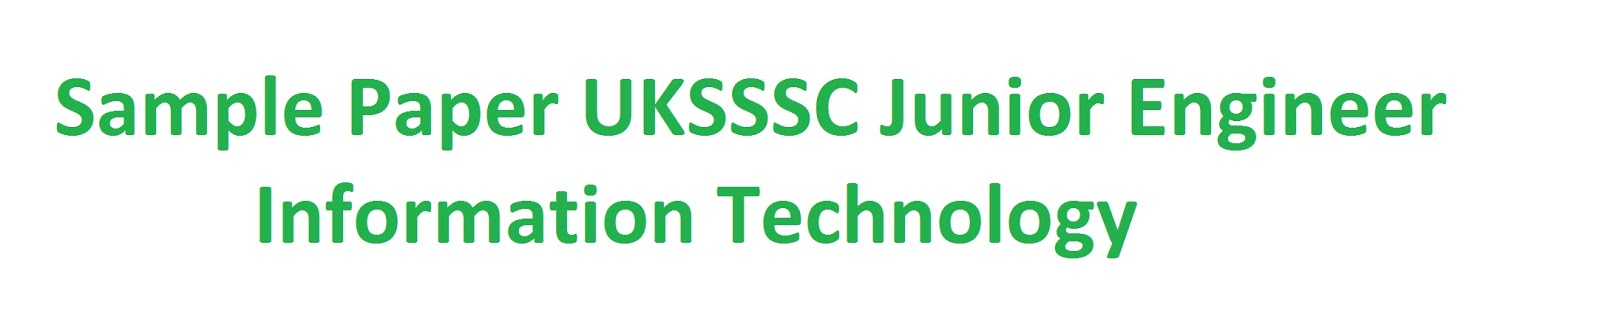 Sample paper UKSSSC JE IT